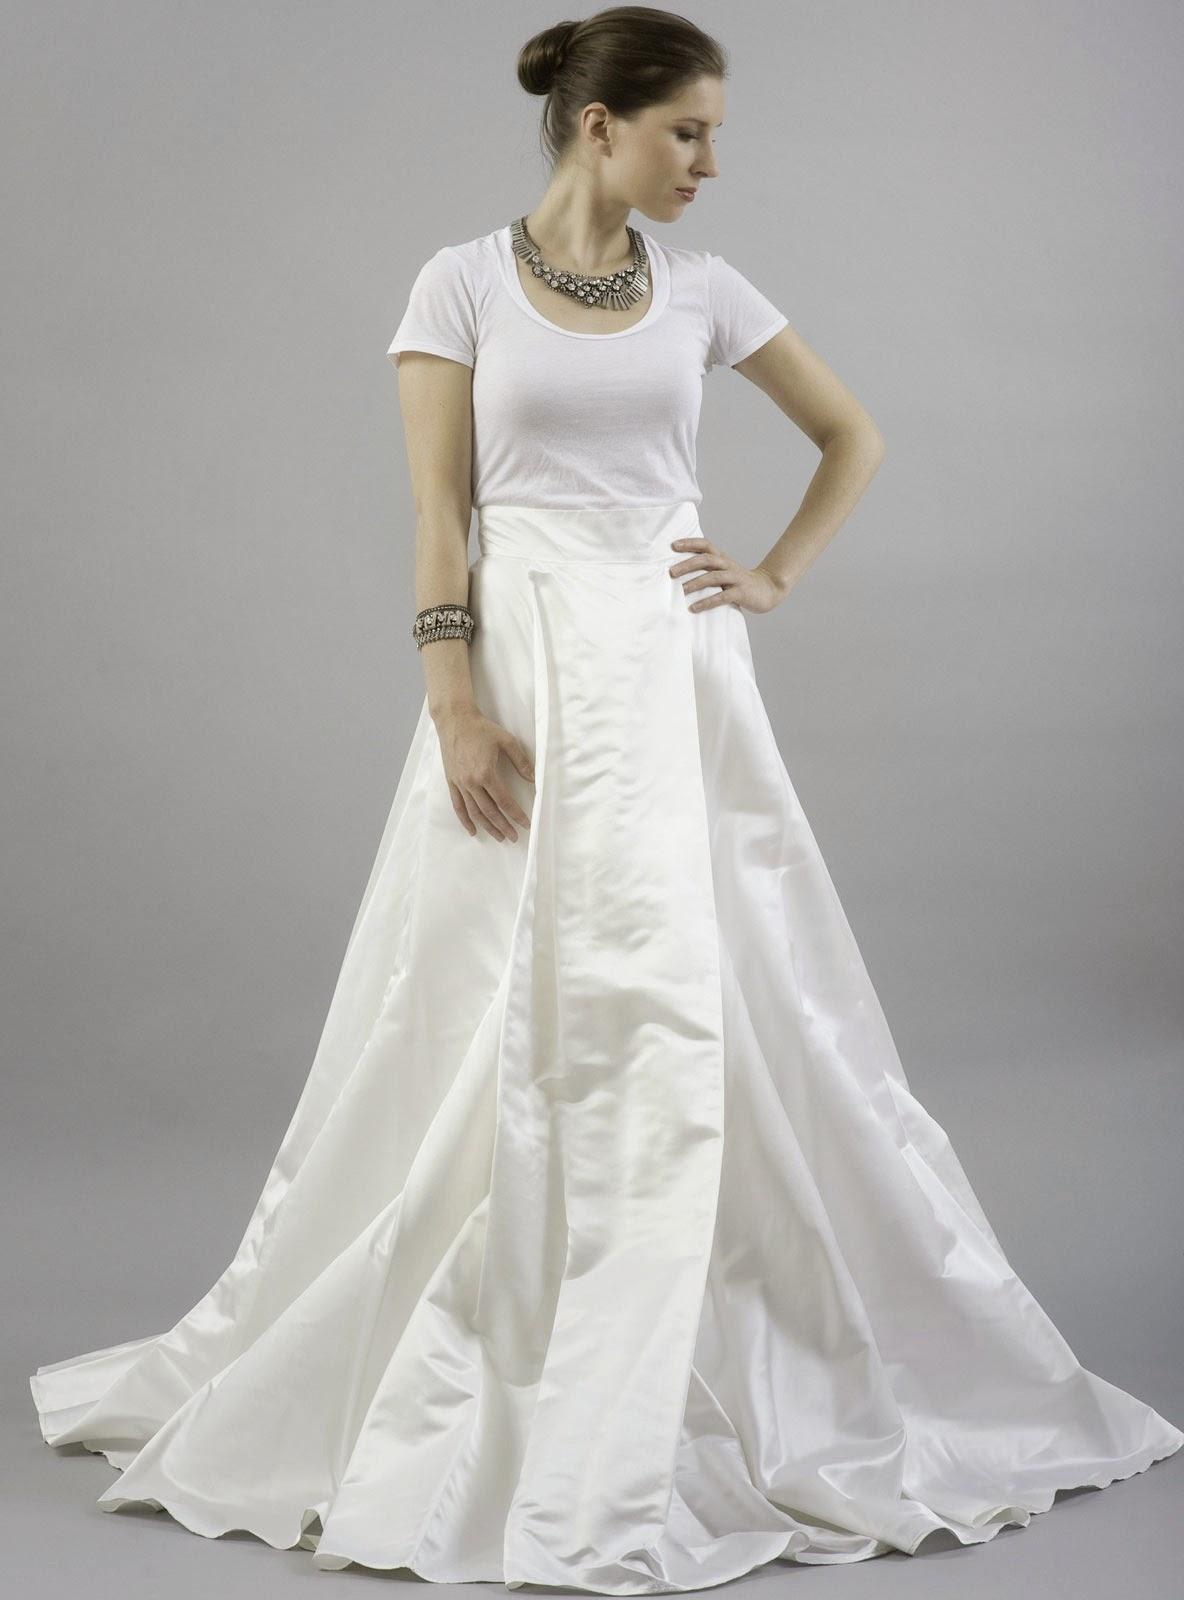 pinterest wedding dress photo ideas about dresses weddings bridal simple images